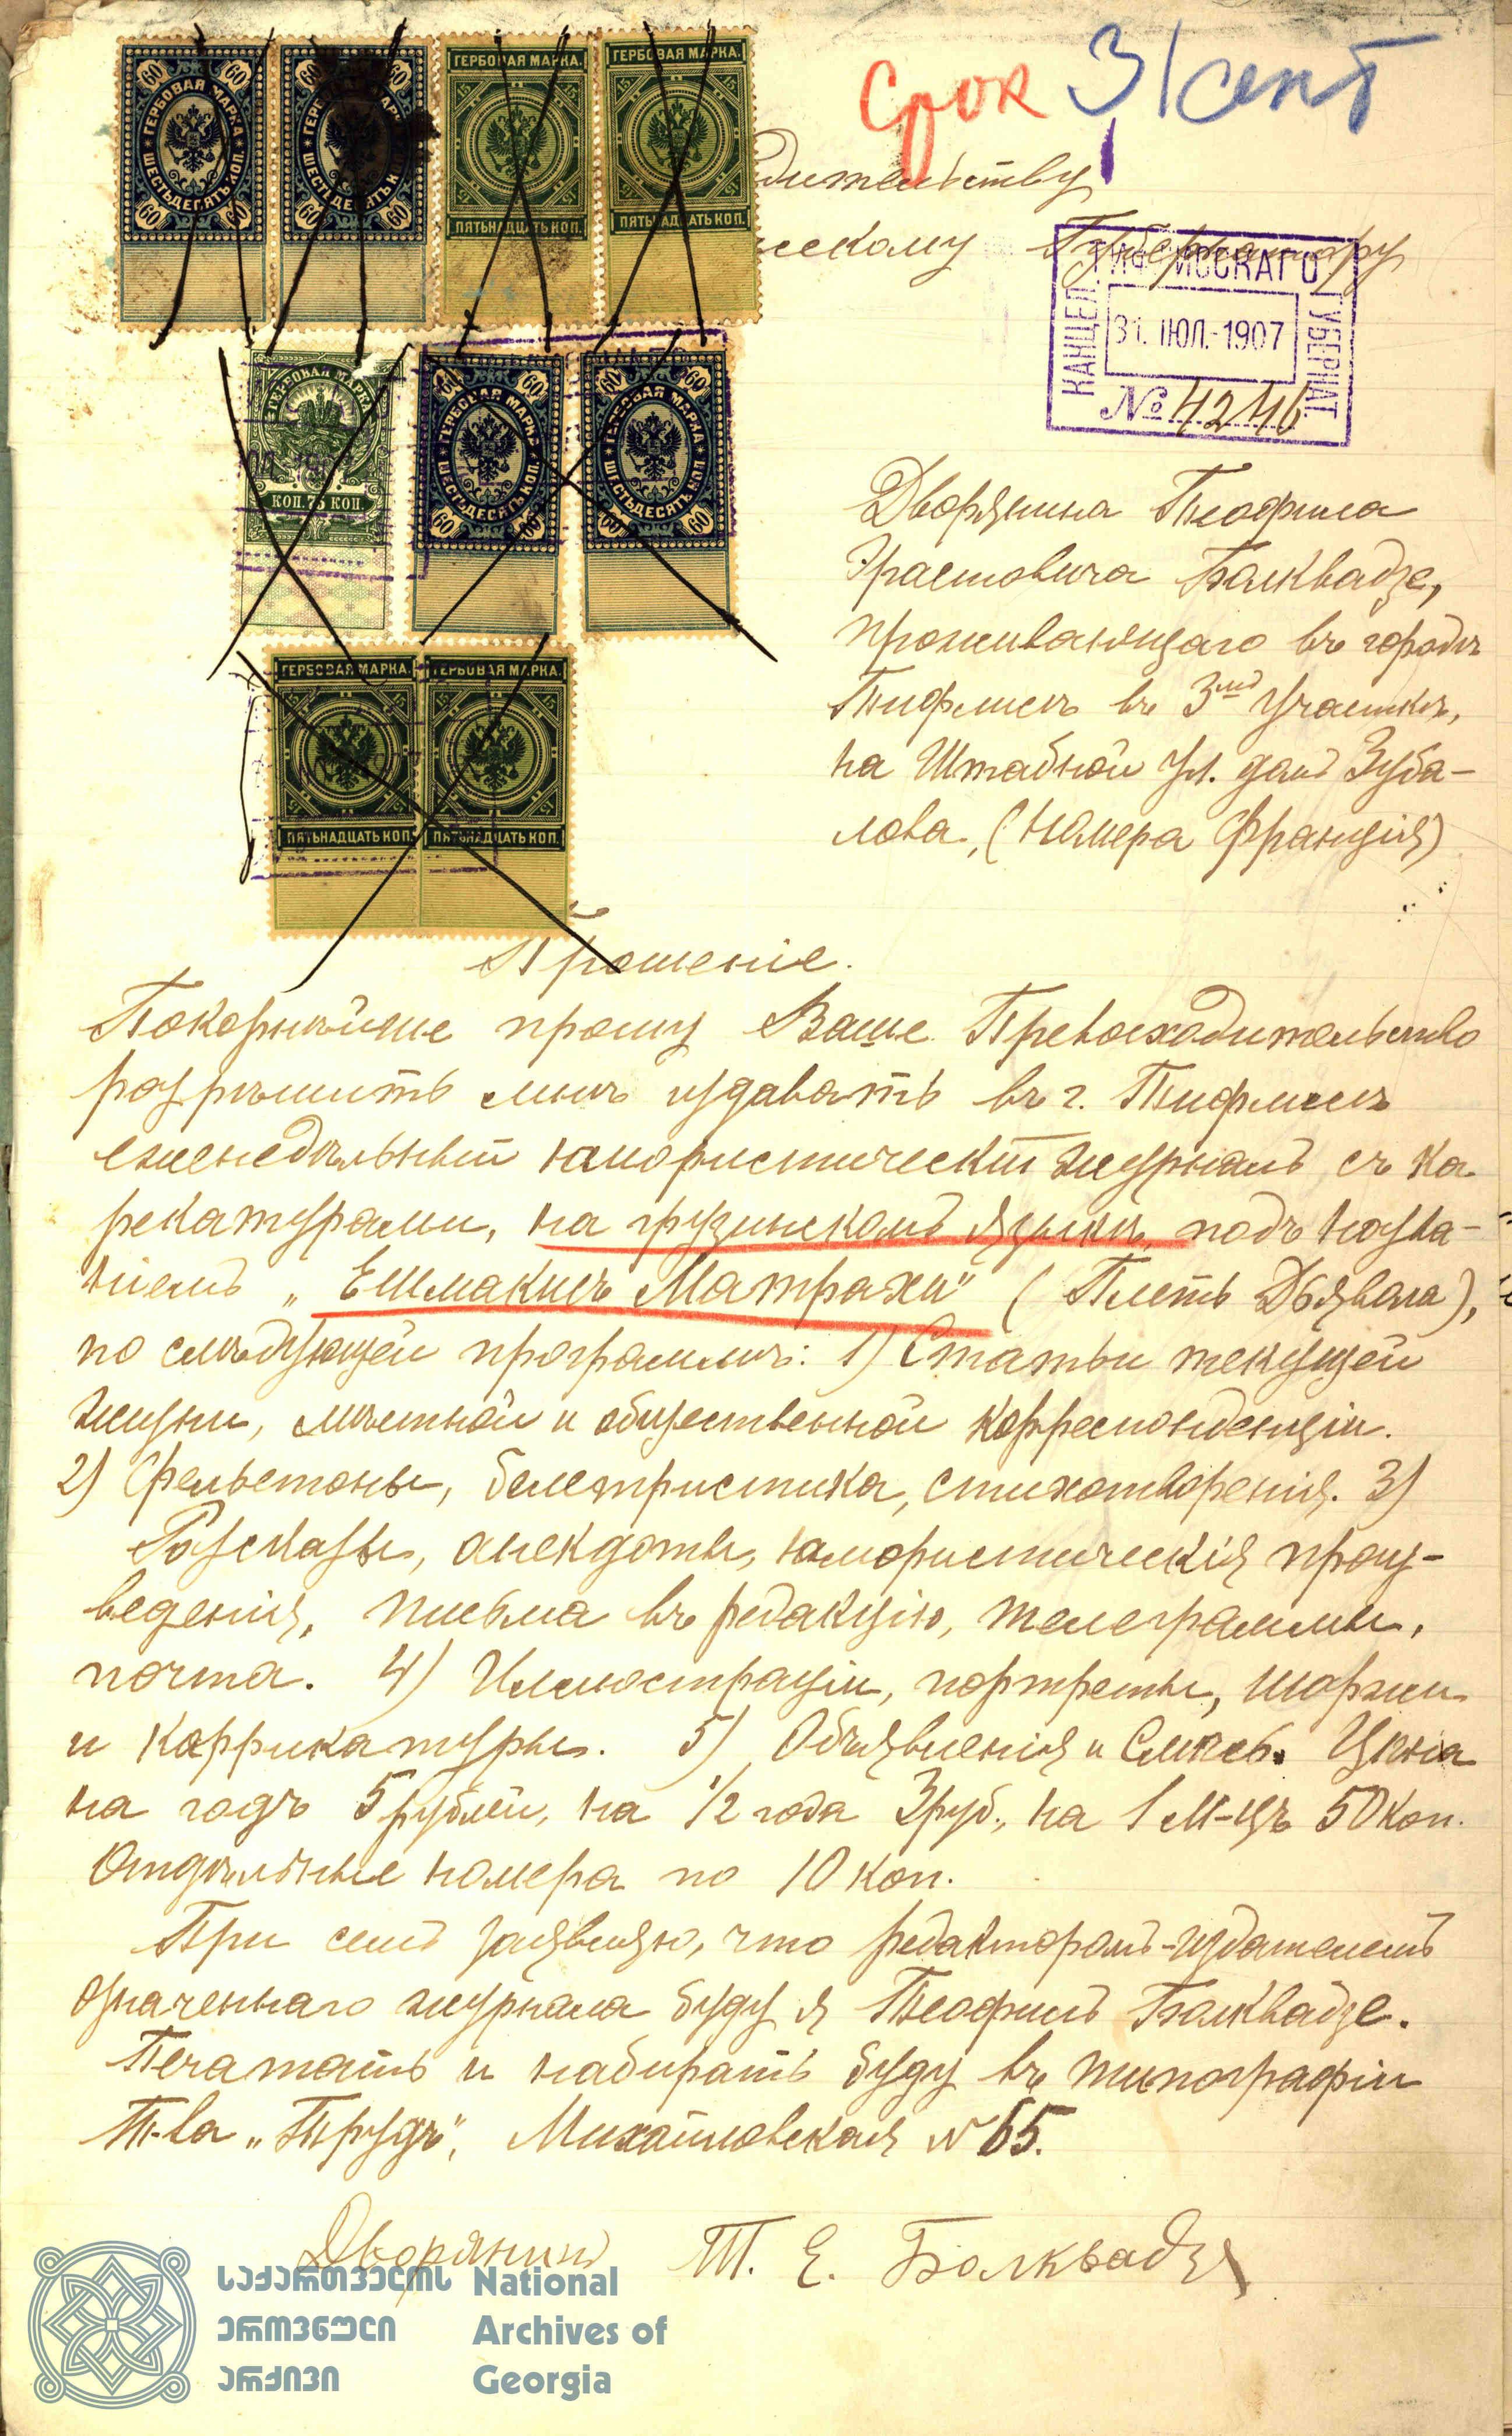 Teofil Bolkvadze's Petitions